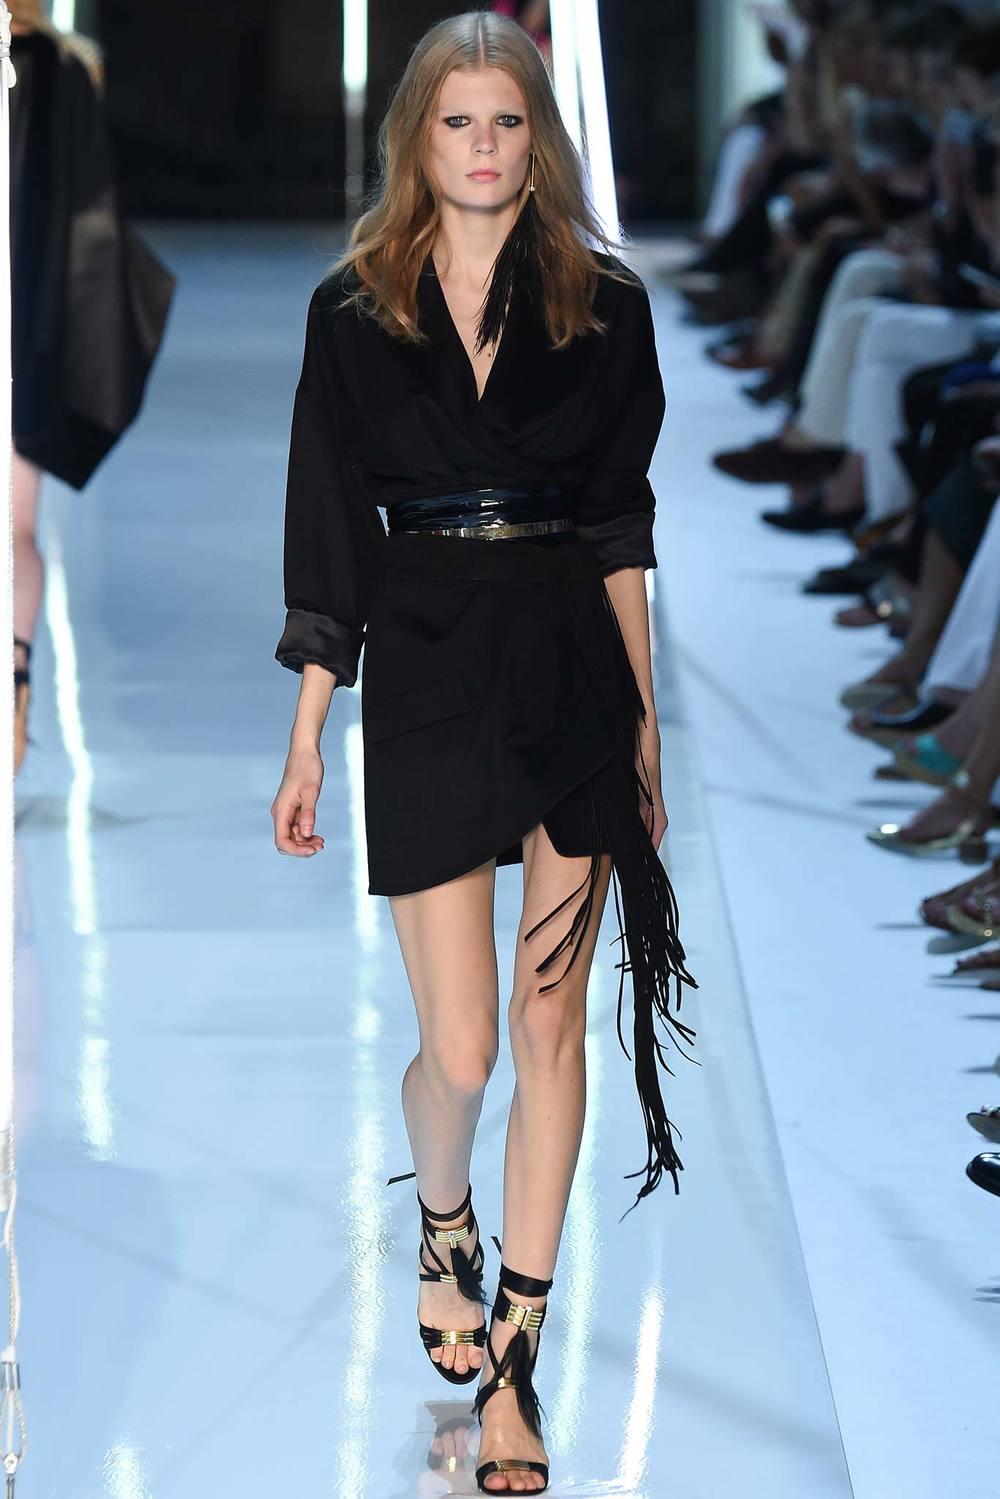 Alexandre-Vauthier-Haute-Couture-FW-2015-Paris-4.jpg